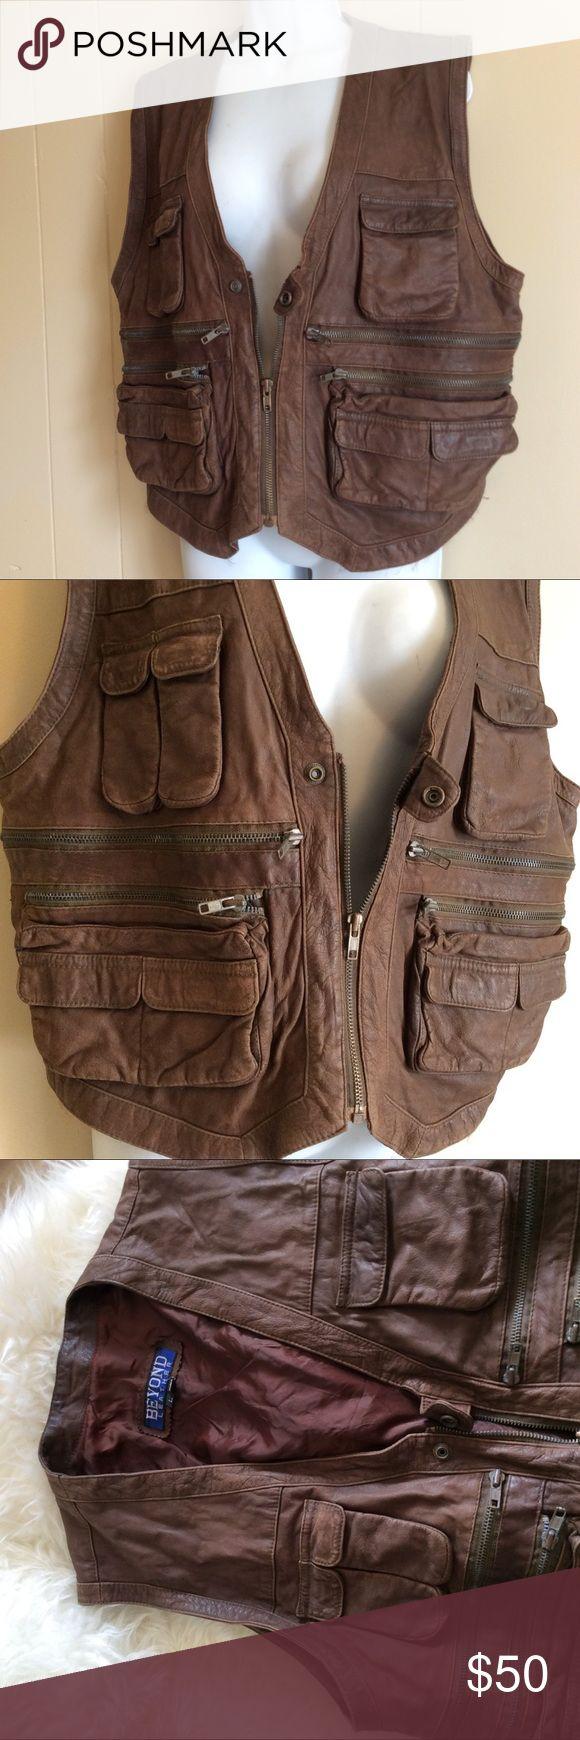 Size Large vintage leather utility vest cargo vest Size Large vintage leather cargo vest. Every pocket, zipper, etc functioning. Hipster hippie boho style. Jackets & Coats Vests